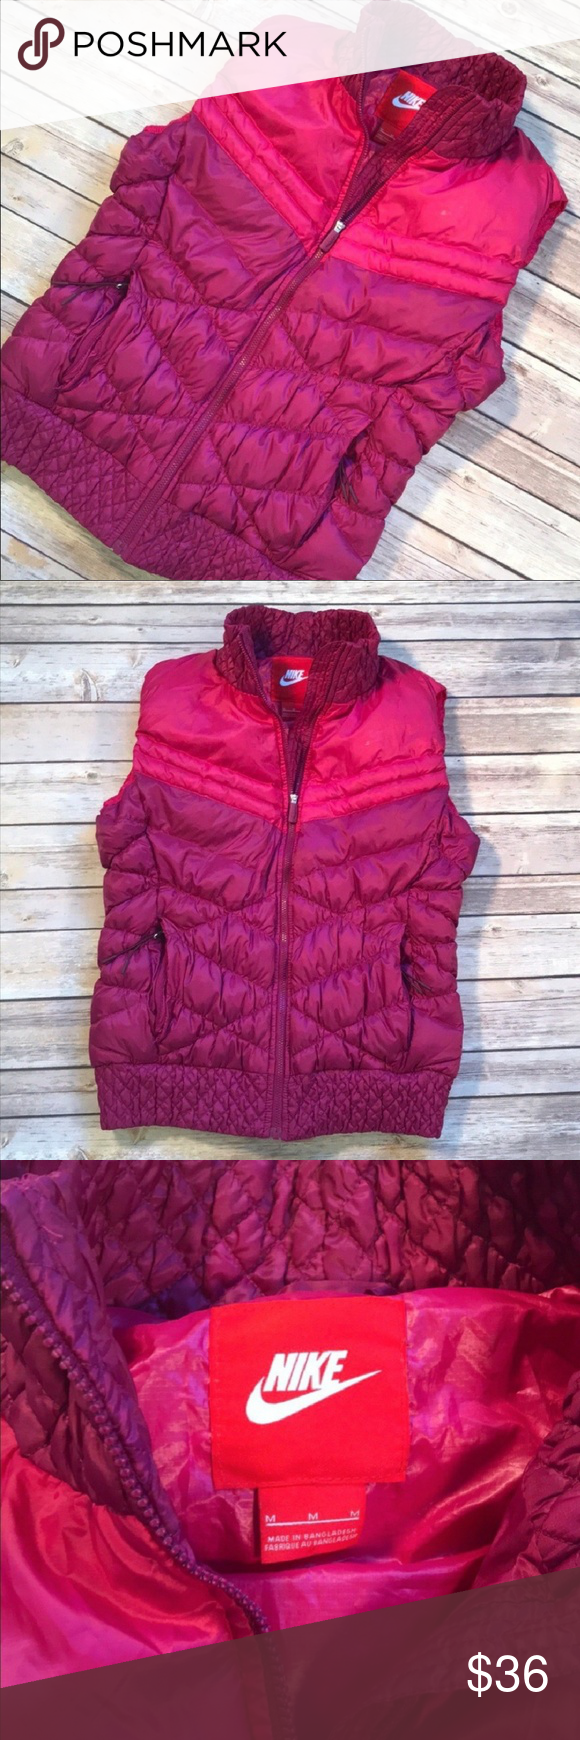 c3e56cc86de9 Nike Raspberry Fuchsia Down Puffer Vest Nike down puffer vest in raspberry  and fuchsia. Zippered pockets and zippered front. Down fill.